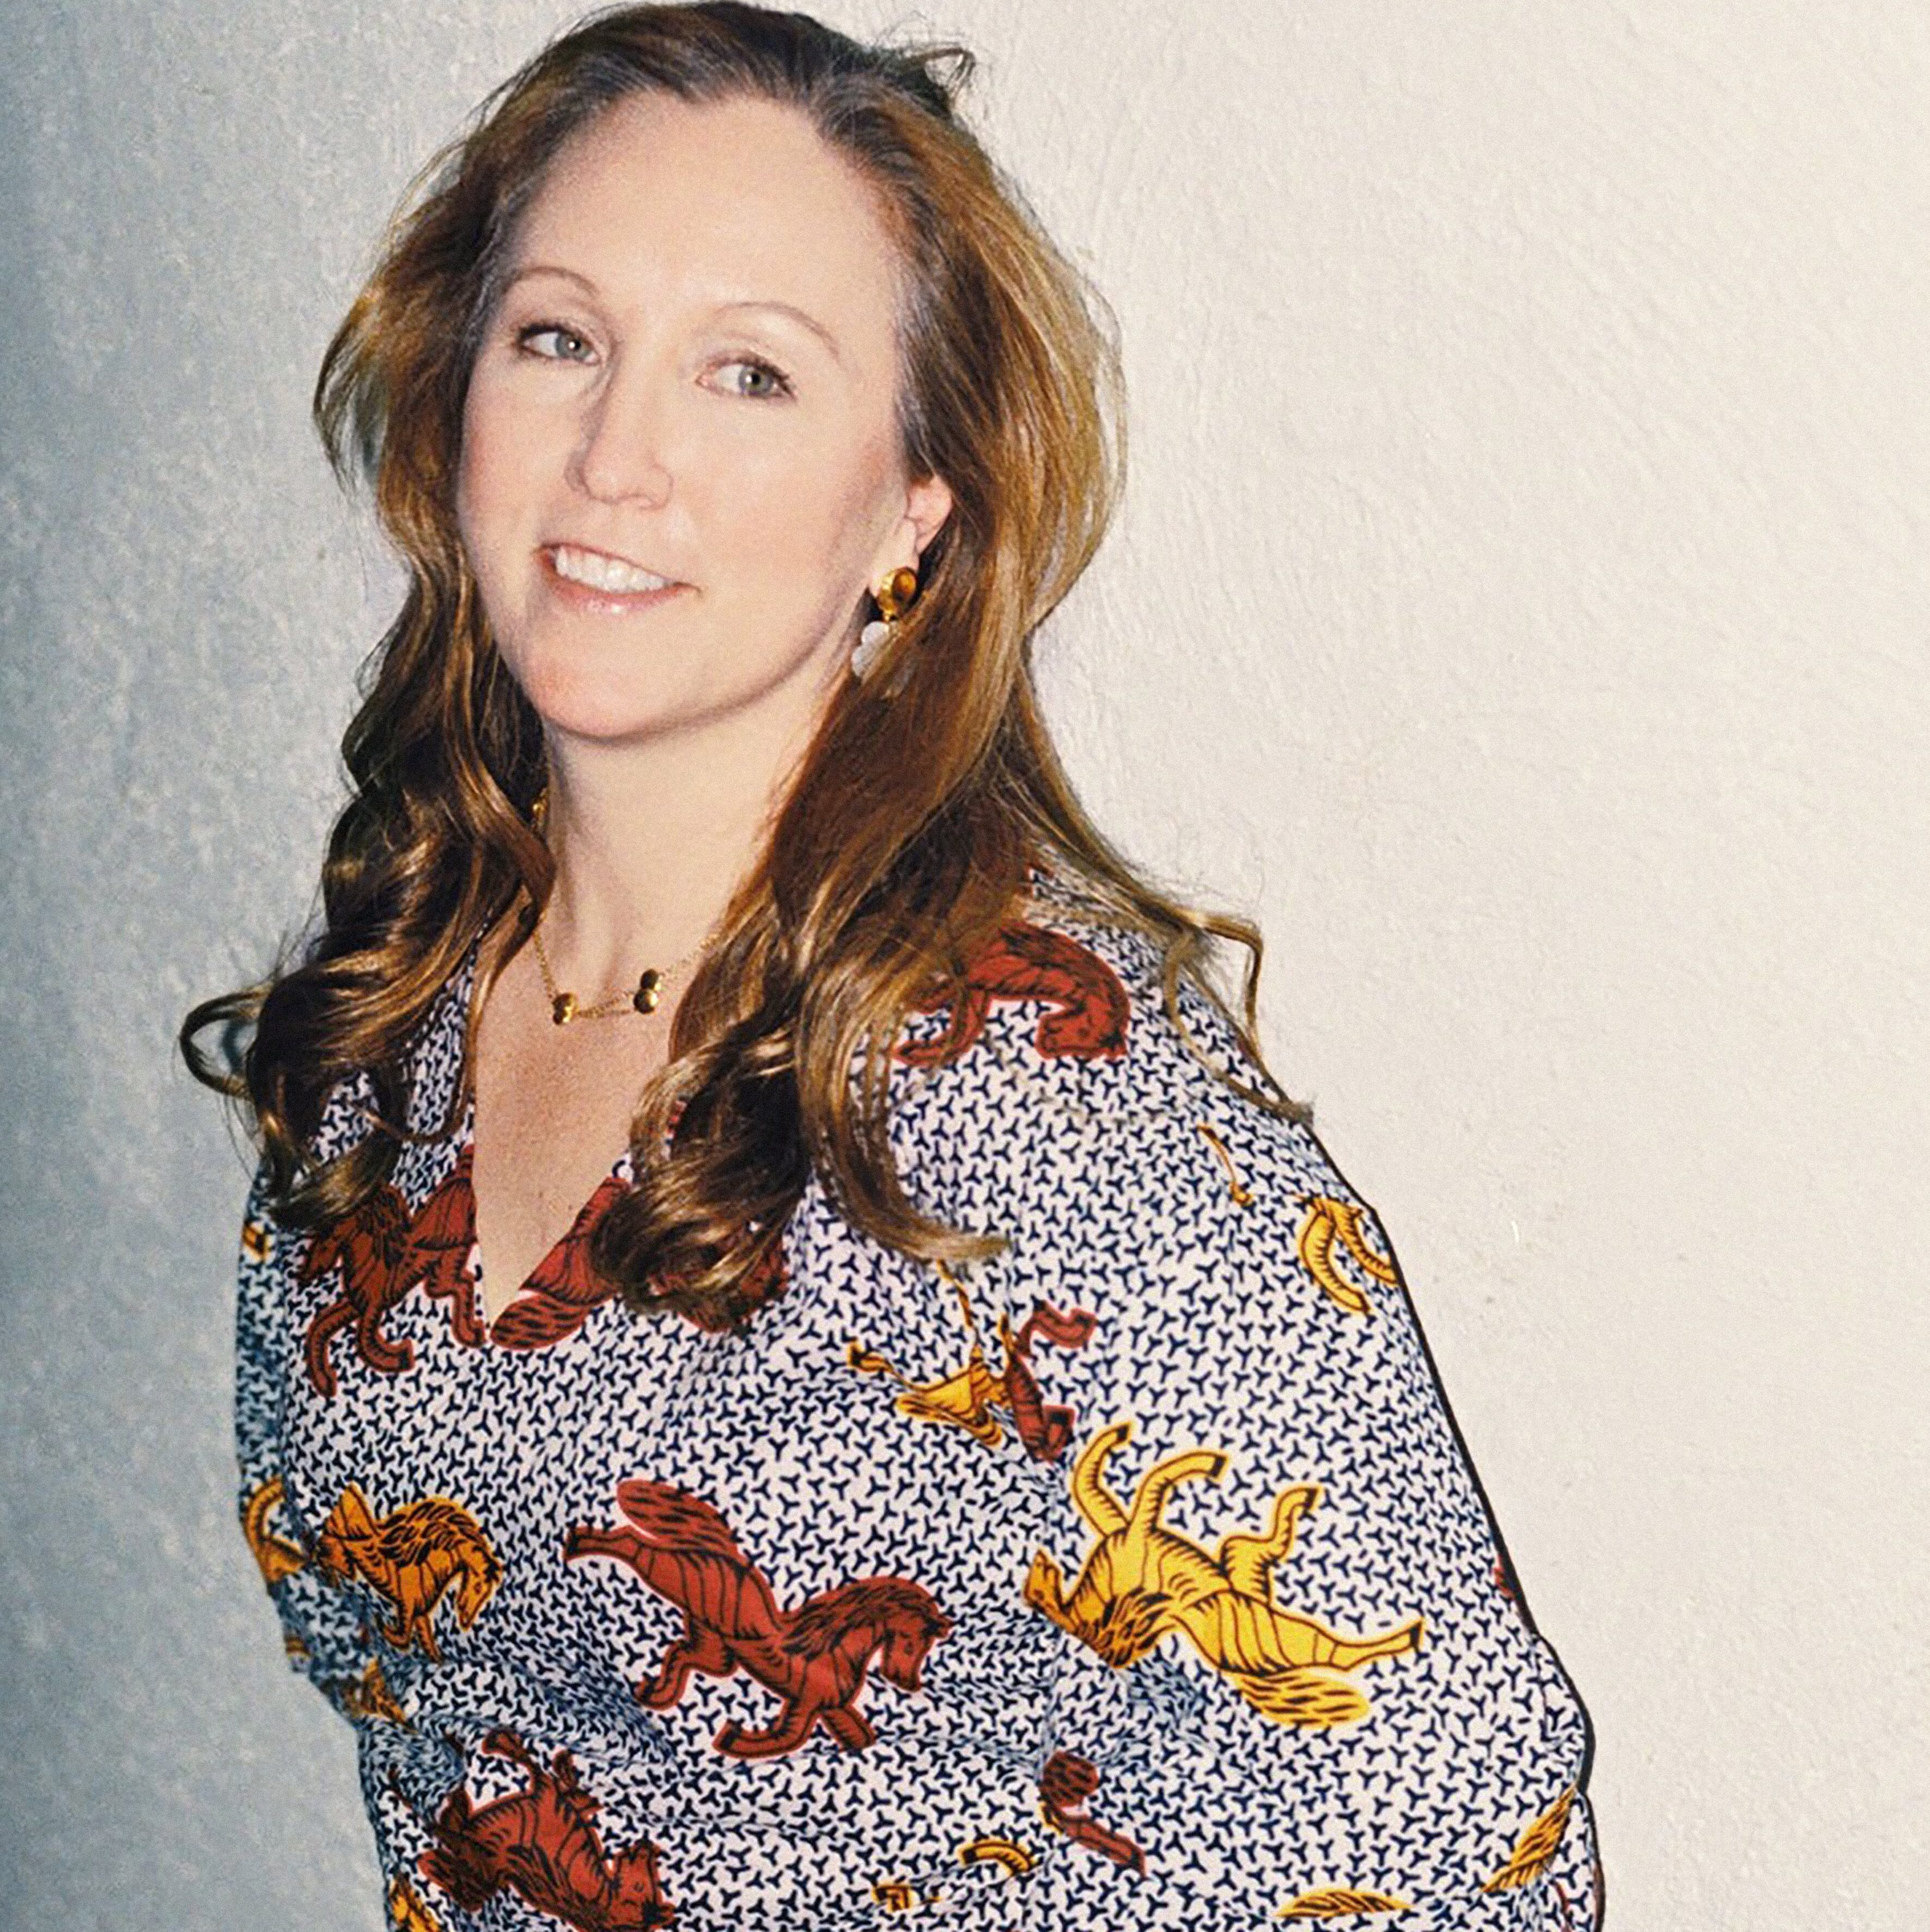 Cristina Ljunberg FemTech leader/investor